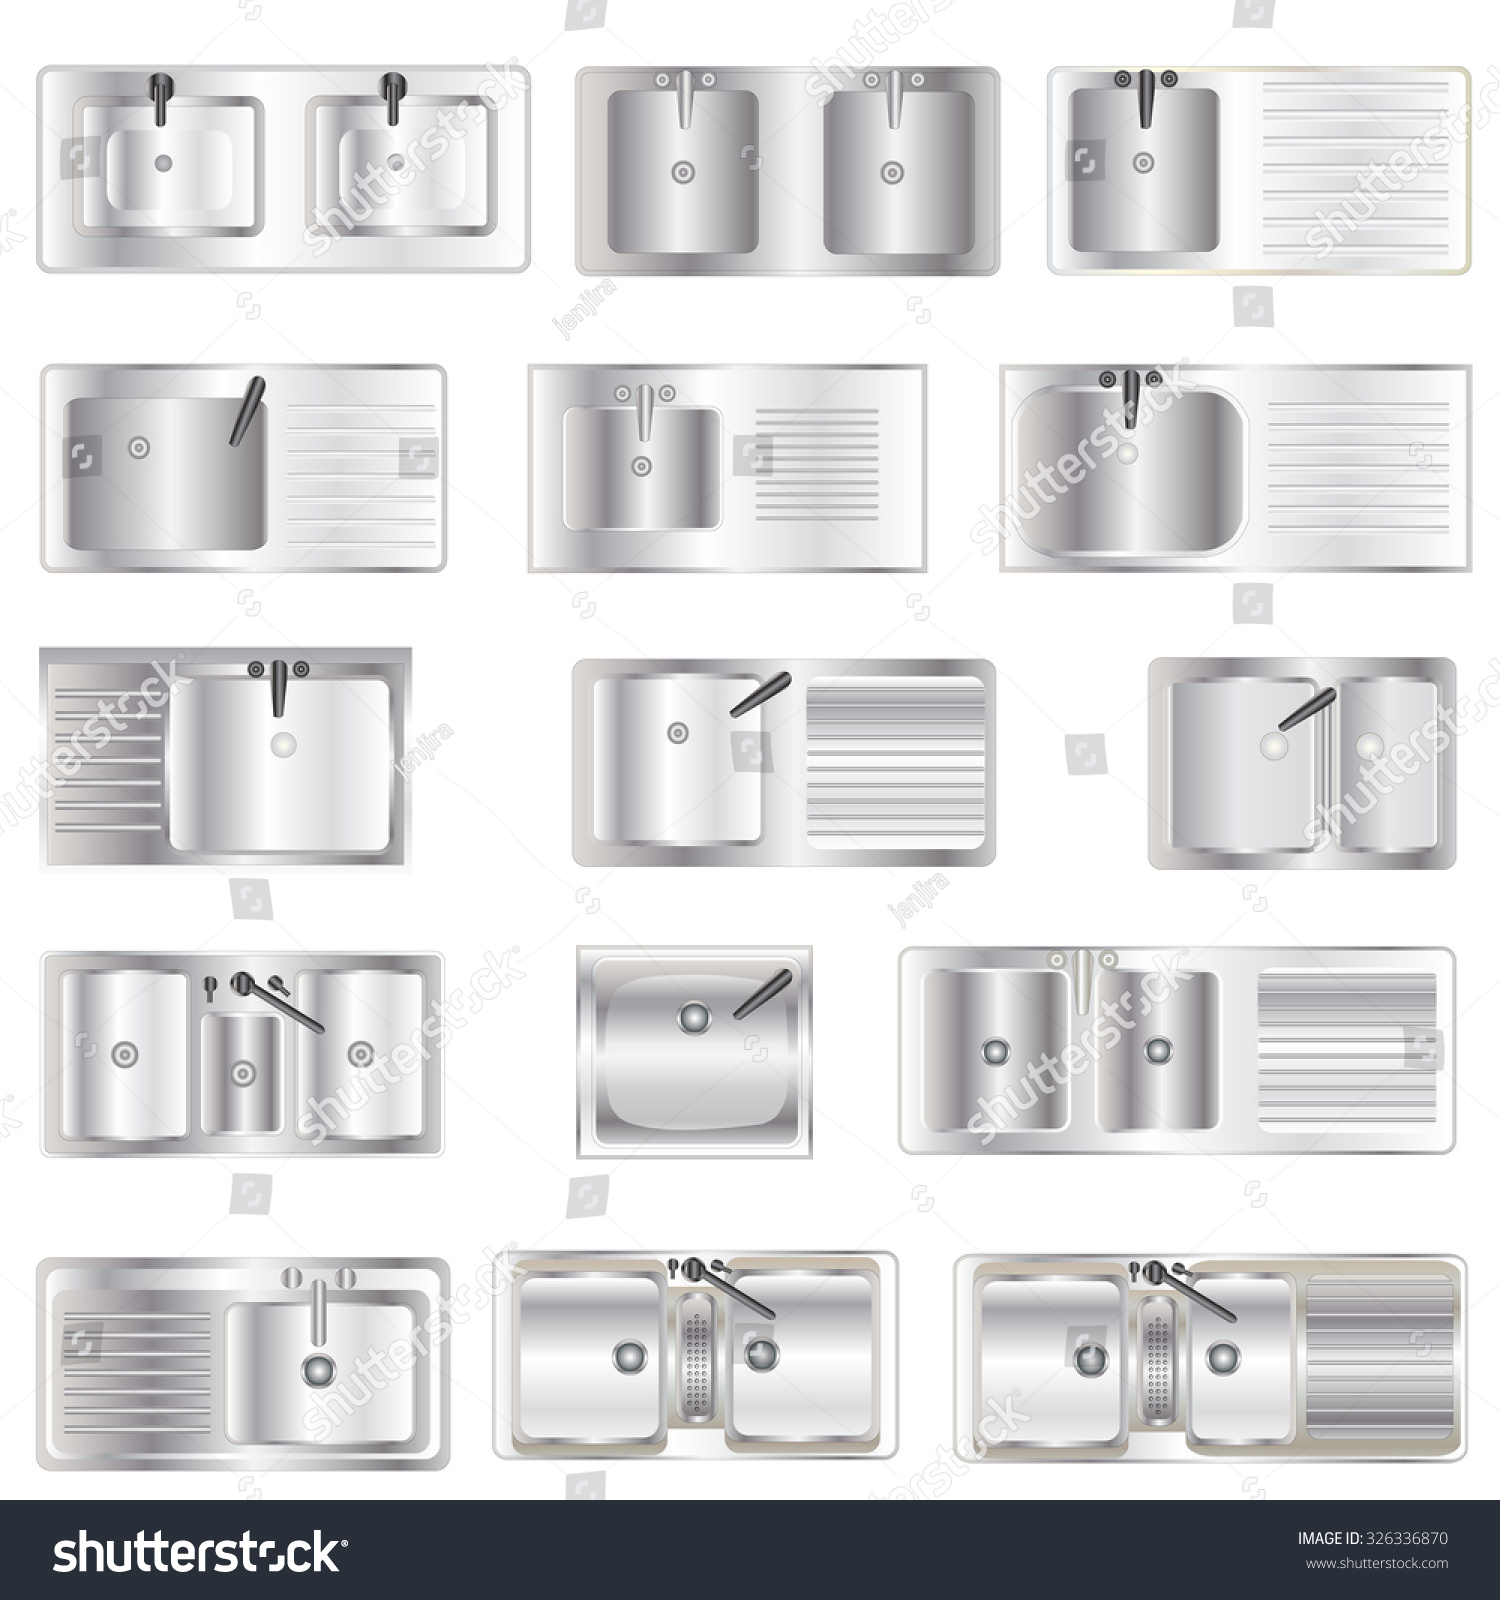 Kitchen Top View : Royalty free kitchen equipment sinks top view set